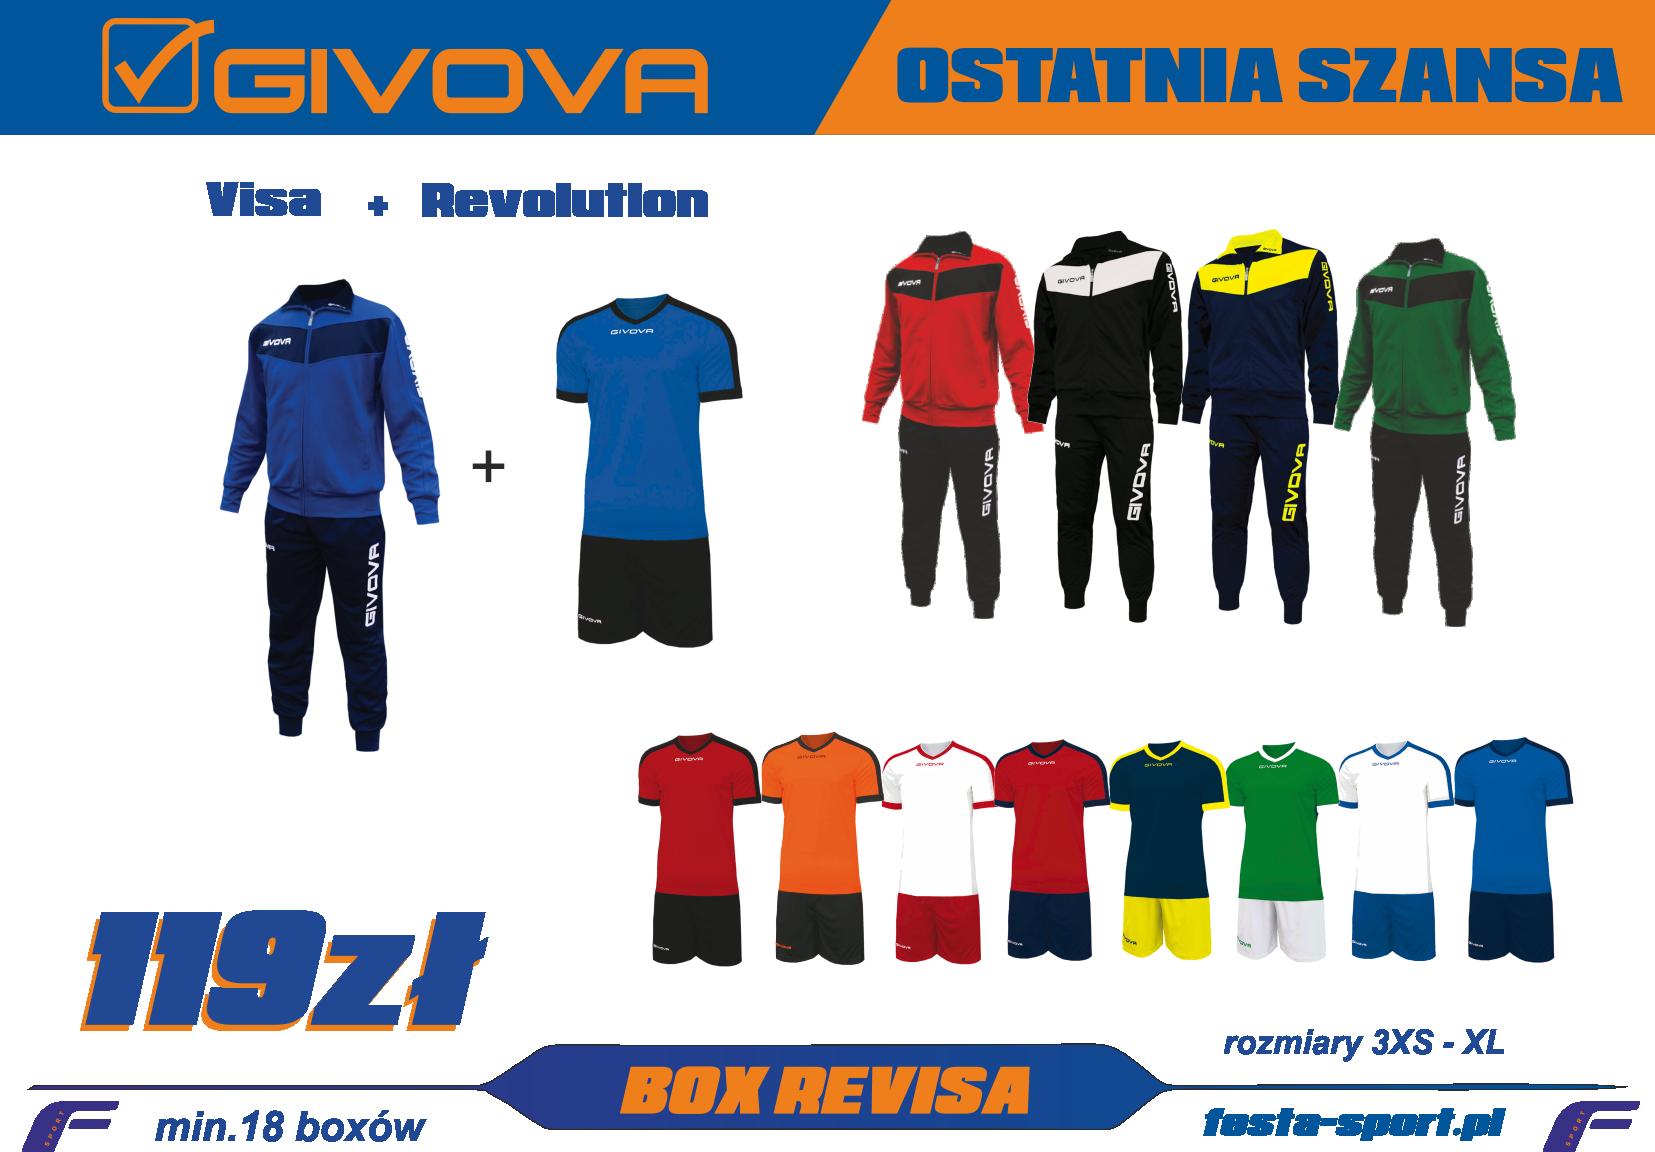 GIVOVA BOX REVISA